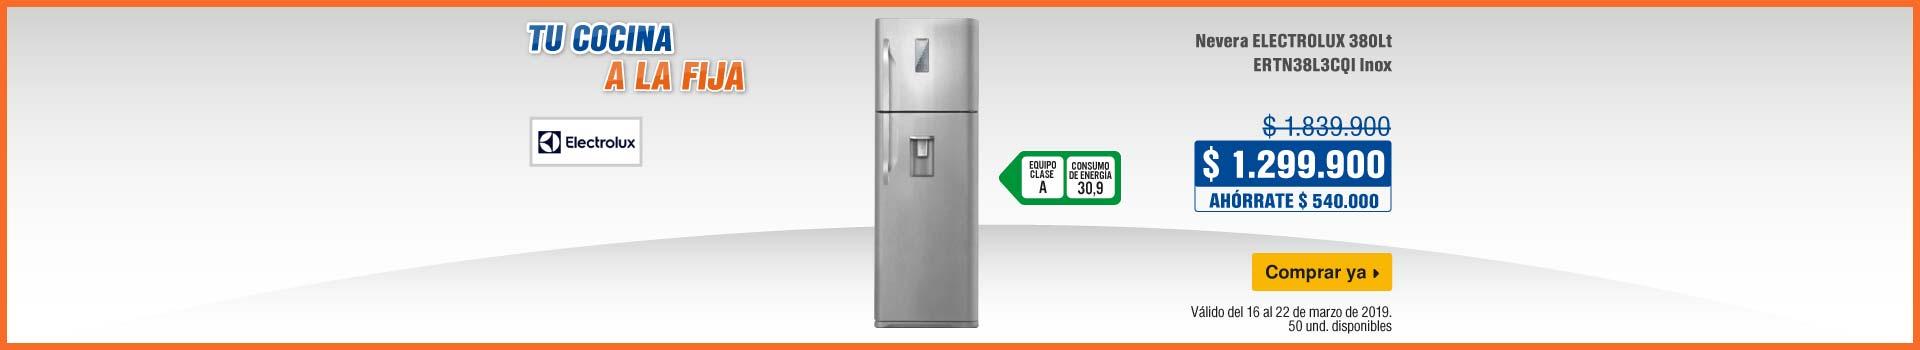 AK-KT-mayores-3-ELECT-BCAT-refrigeracion-electrolux-160319